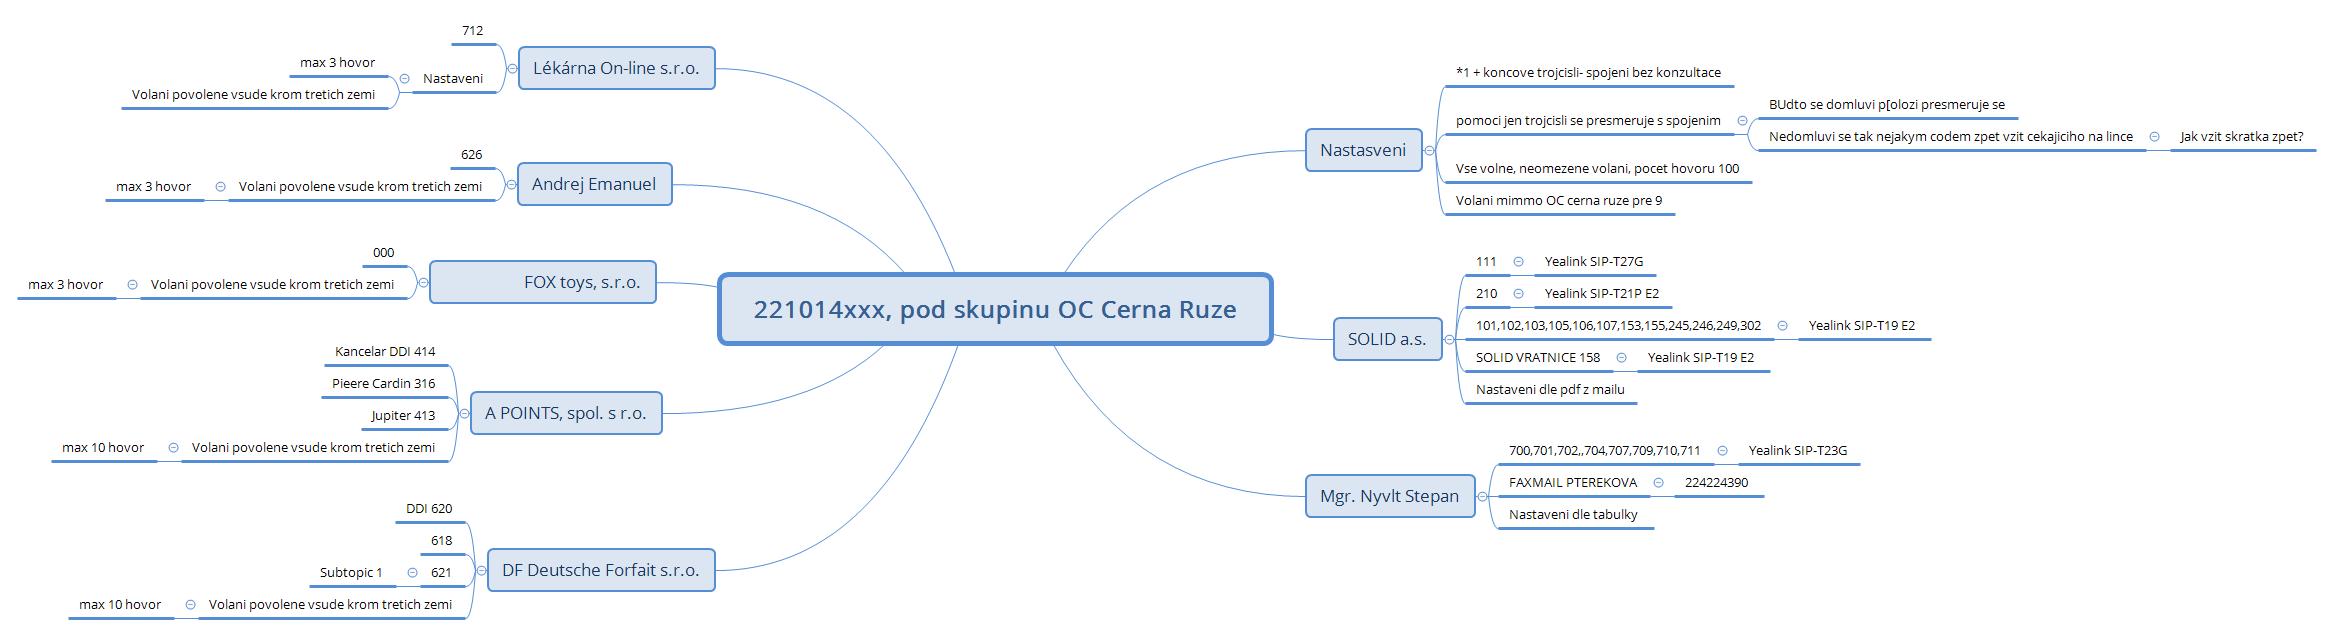 221014xxx, pod skupinu OC Cerna Ruze